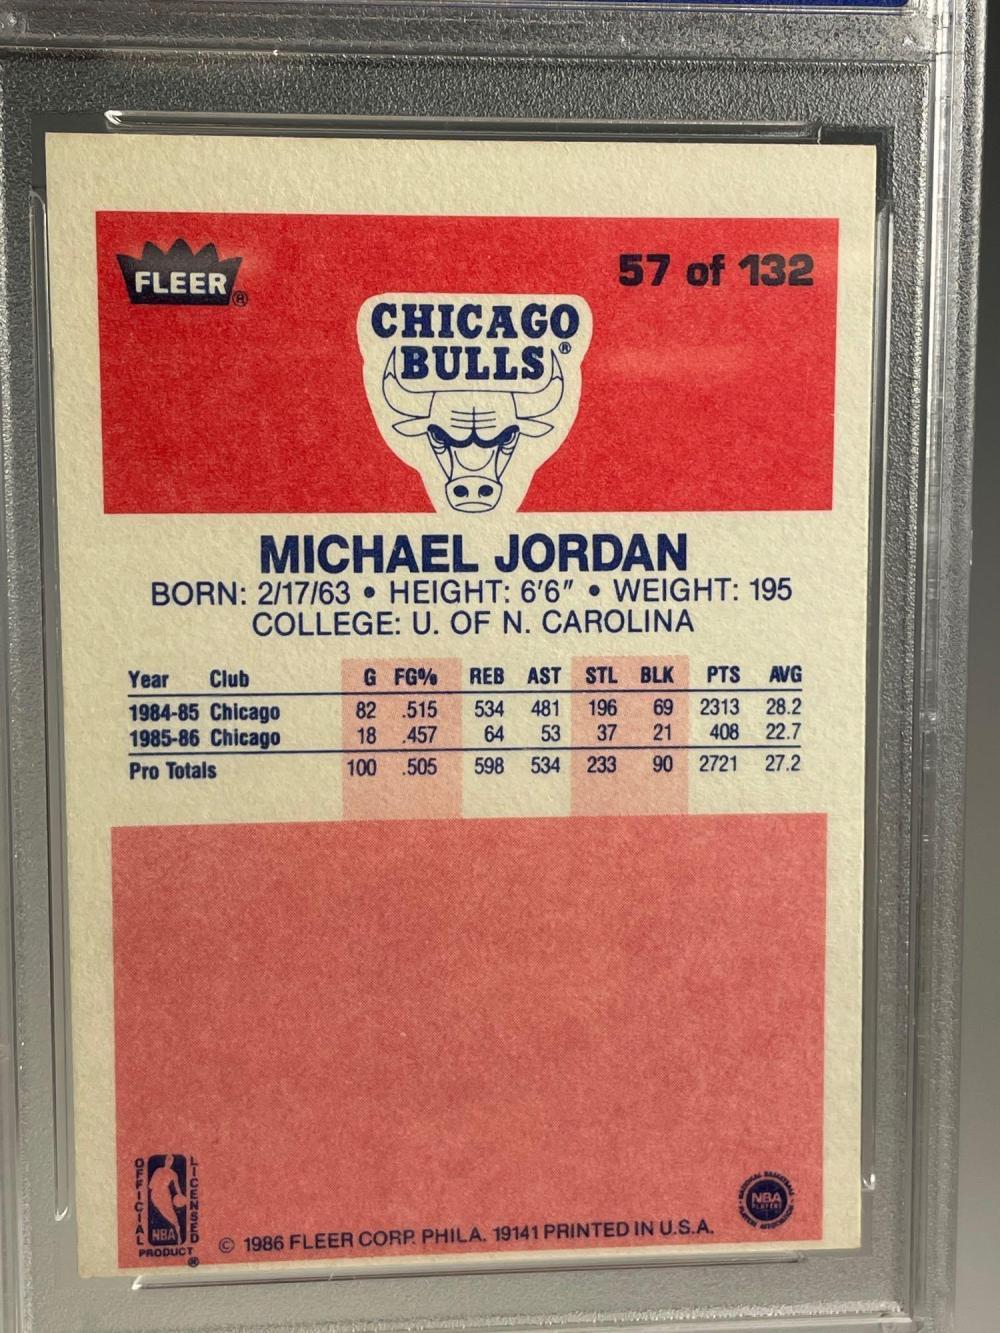 1986 Fleer Basketball #57 Michael Jordan Rookie PSA 8 (OC)